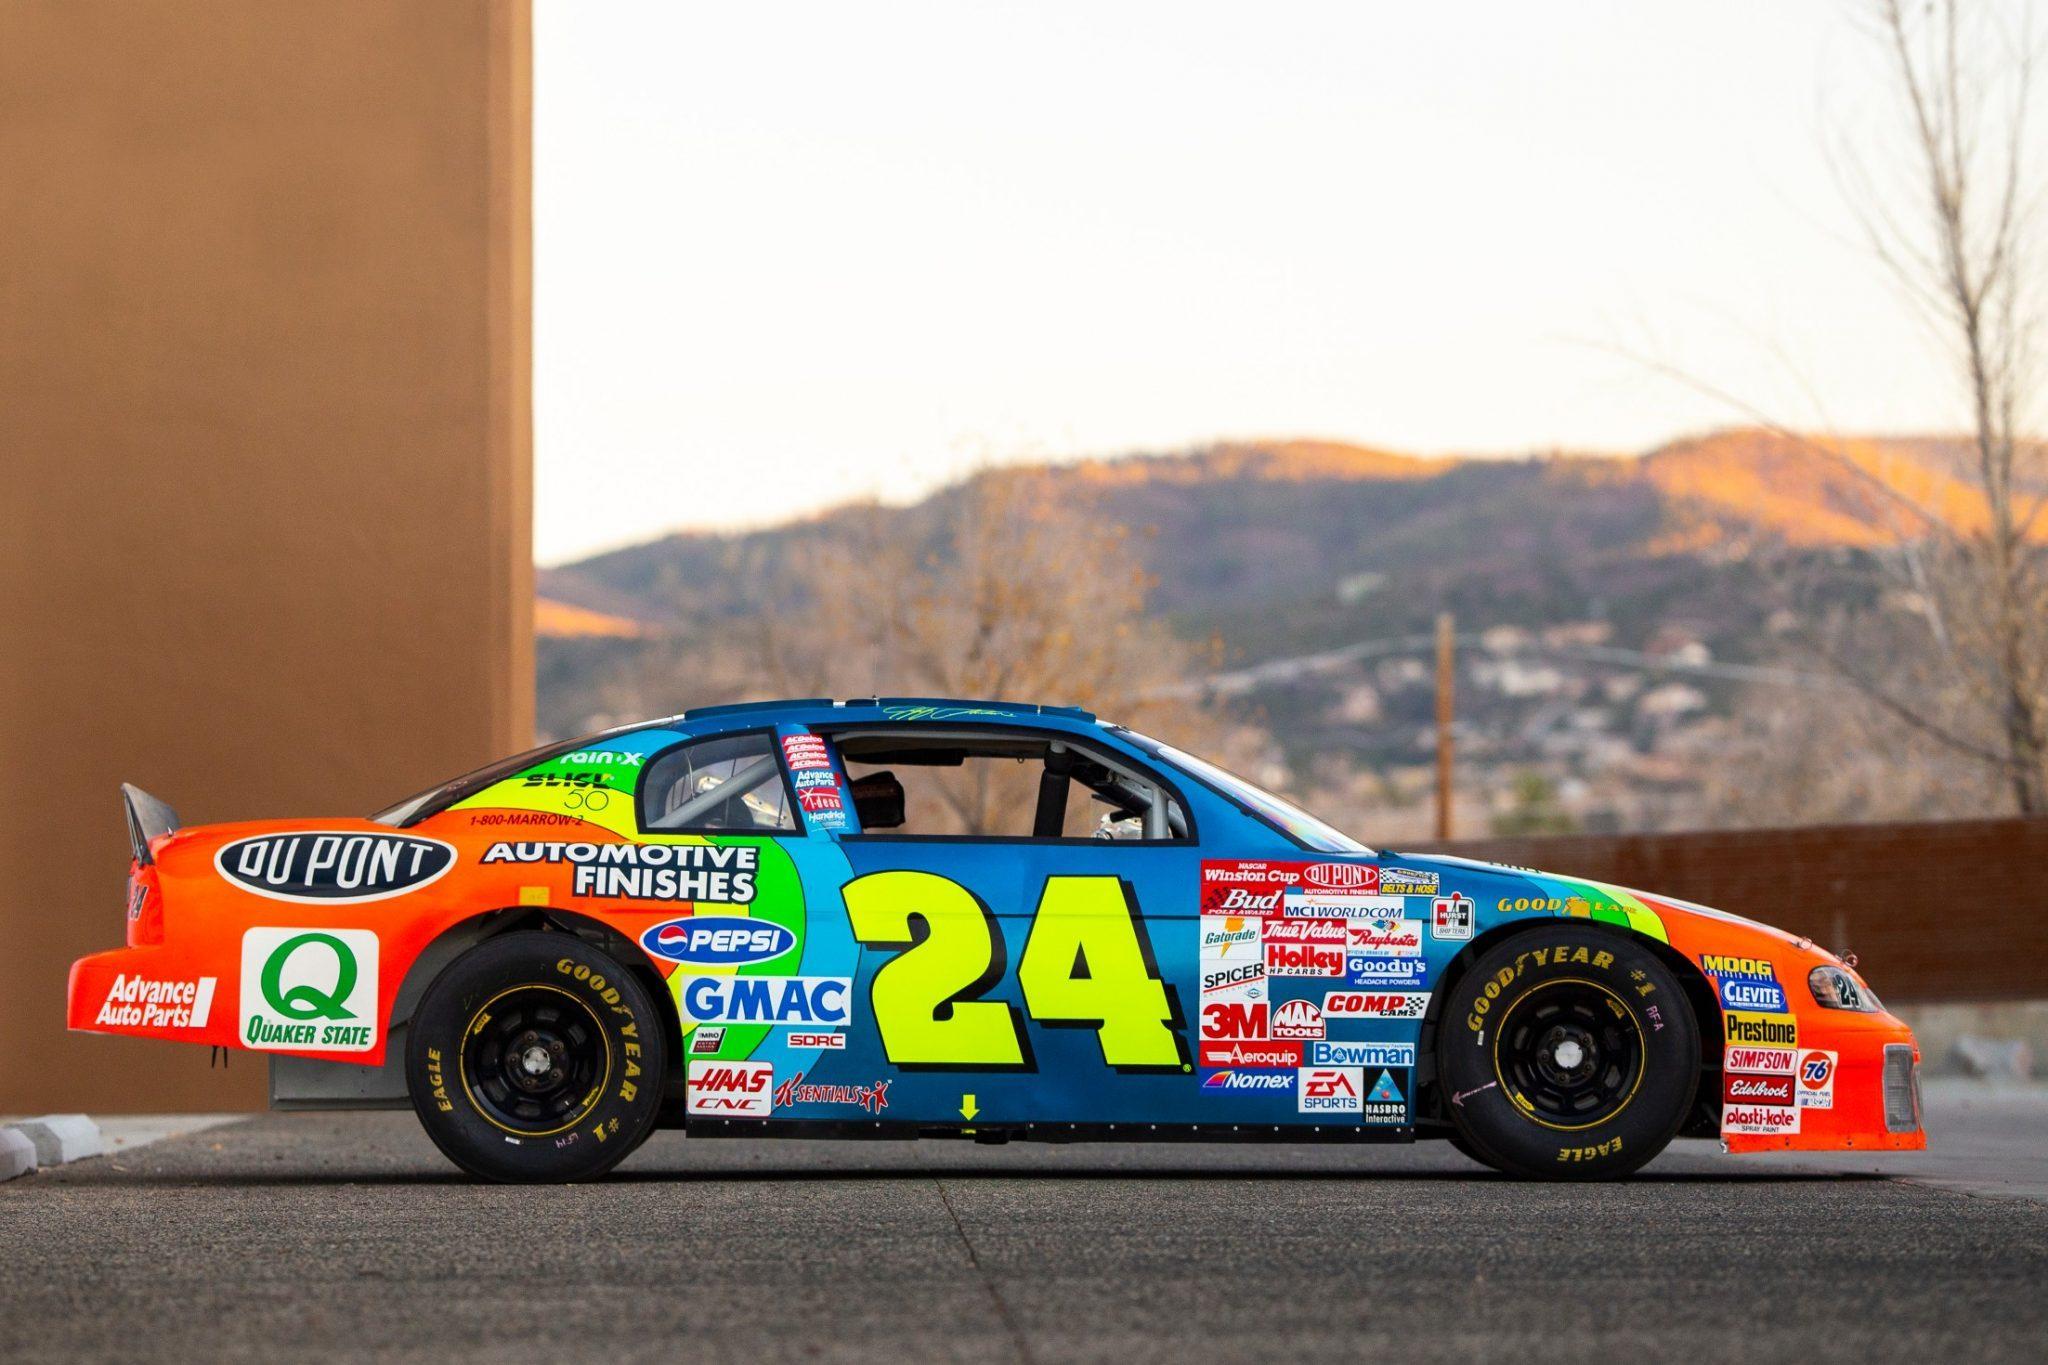 Jeff Gordon car sold - NASCAR Cup Series 24